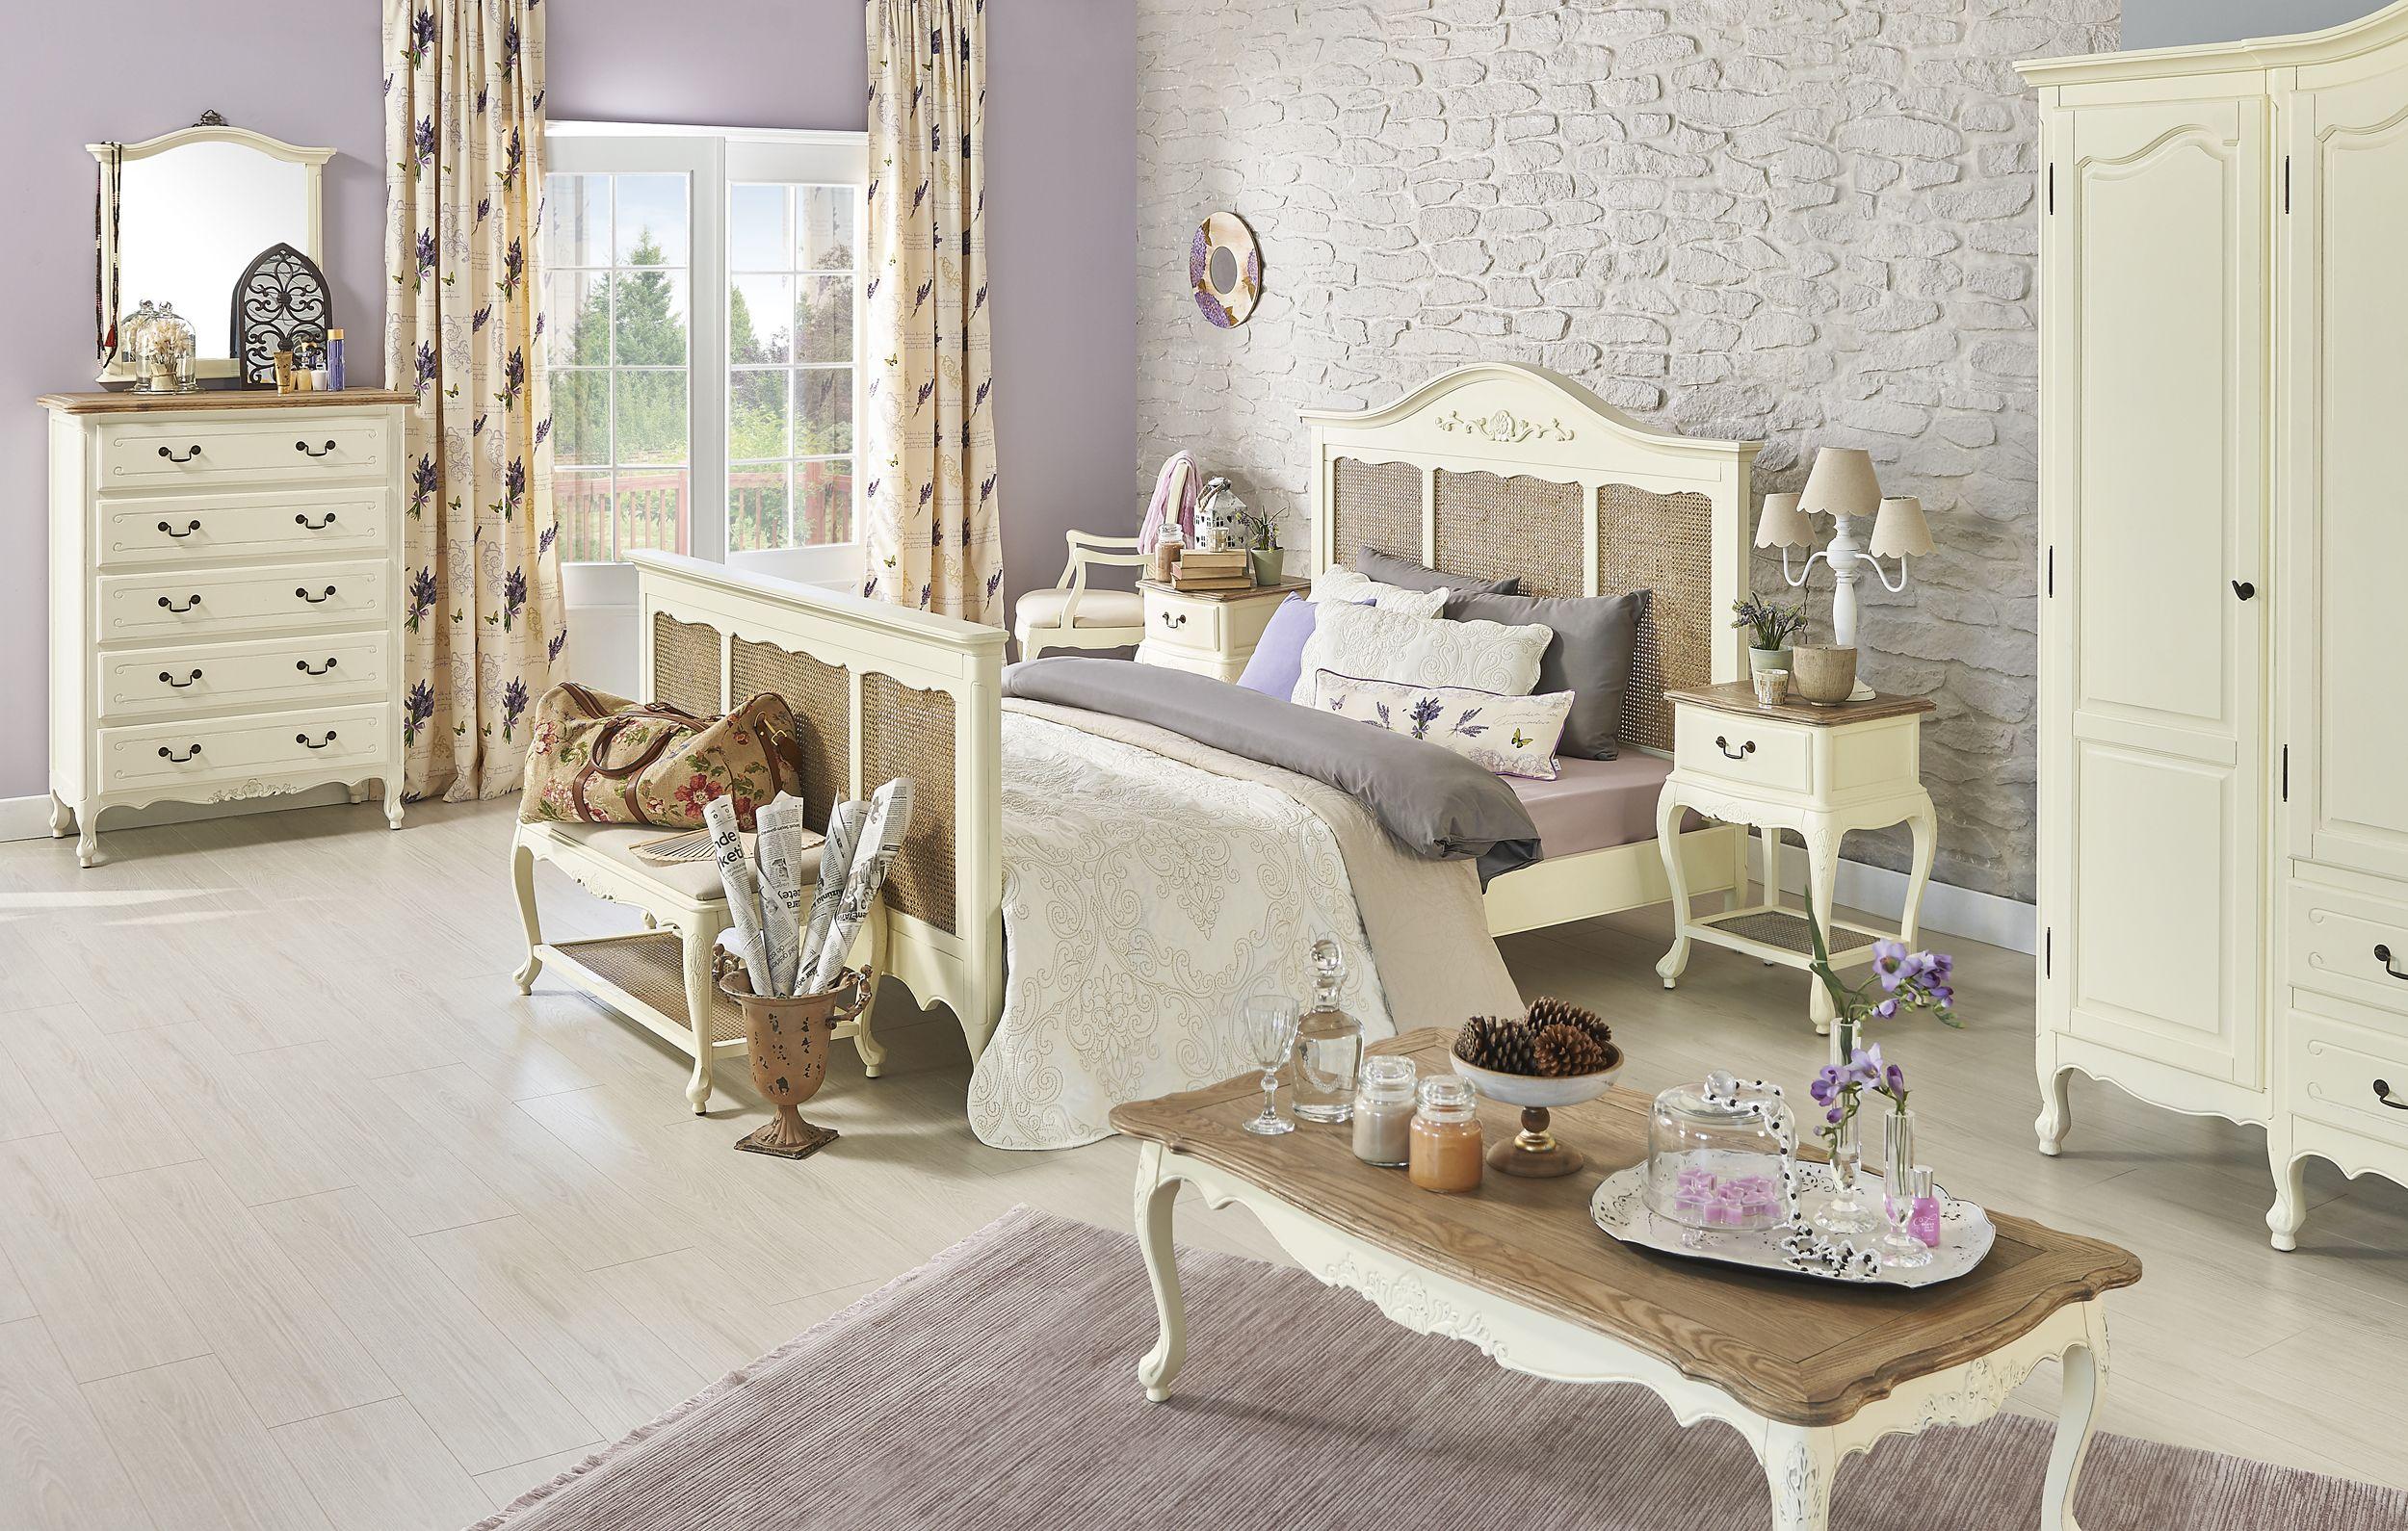 Yatak Odasi Tepehome Yatak Odalari Yatak Odasi Yatak